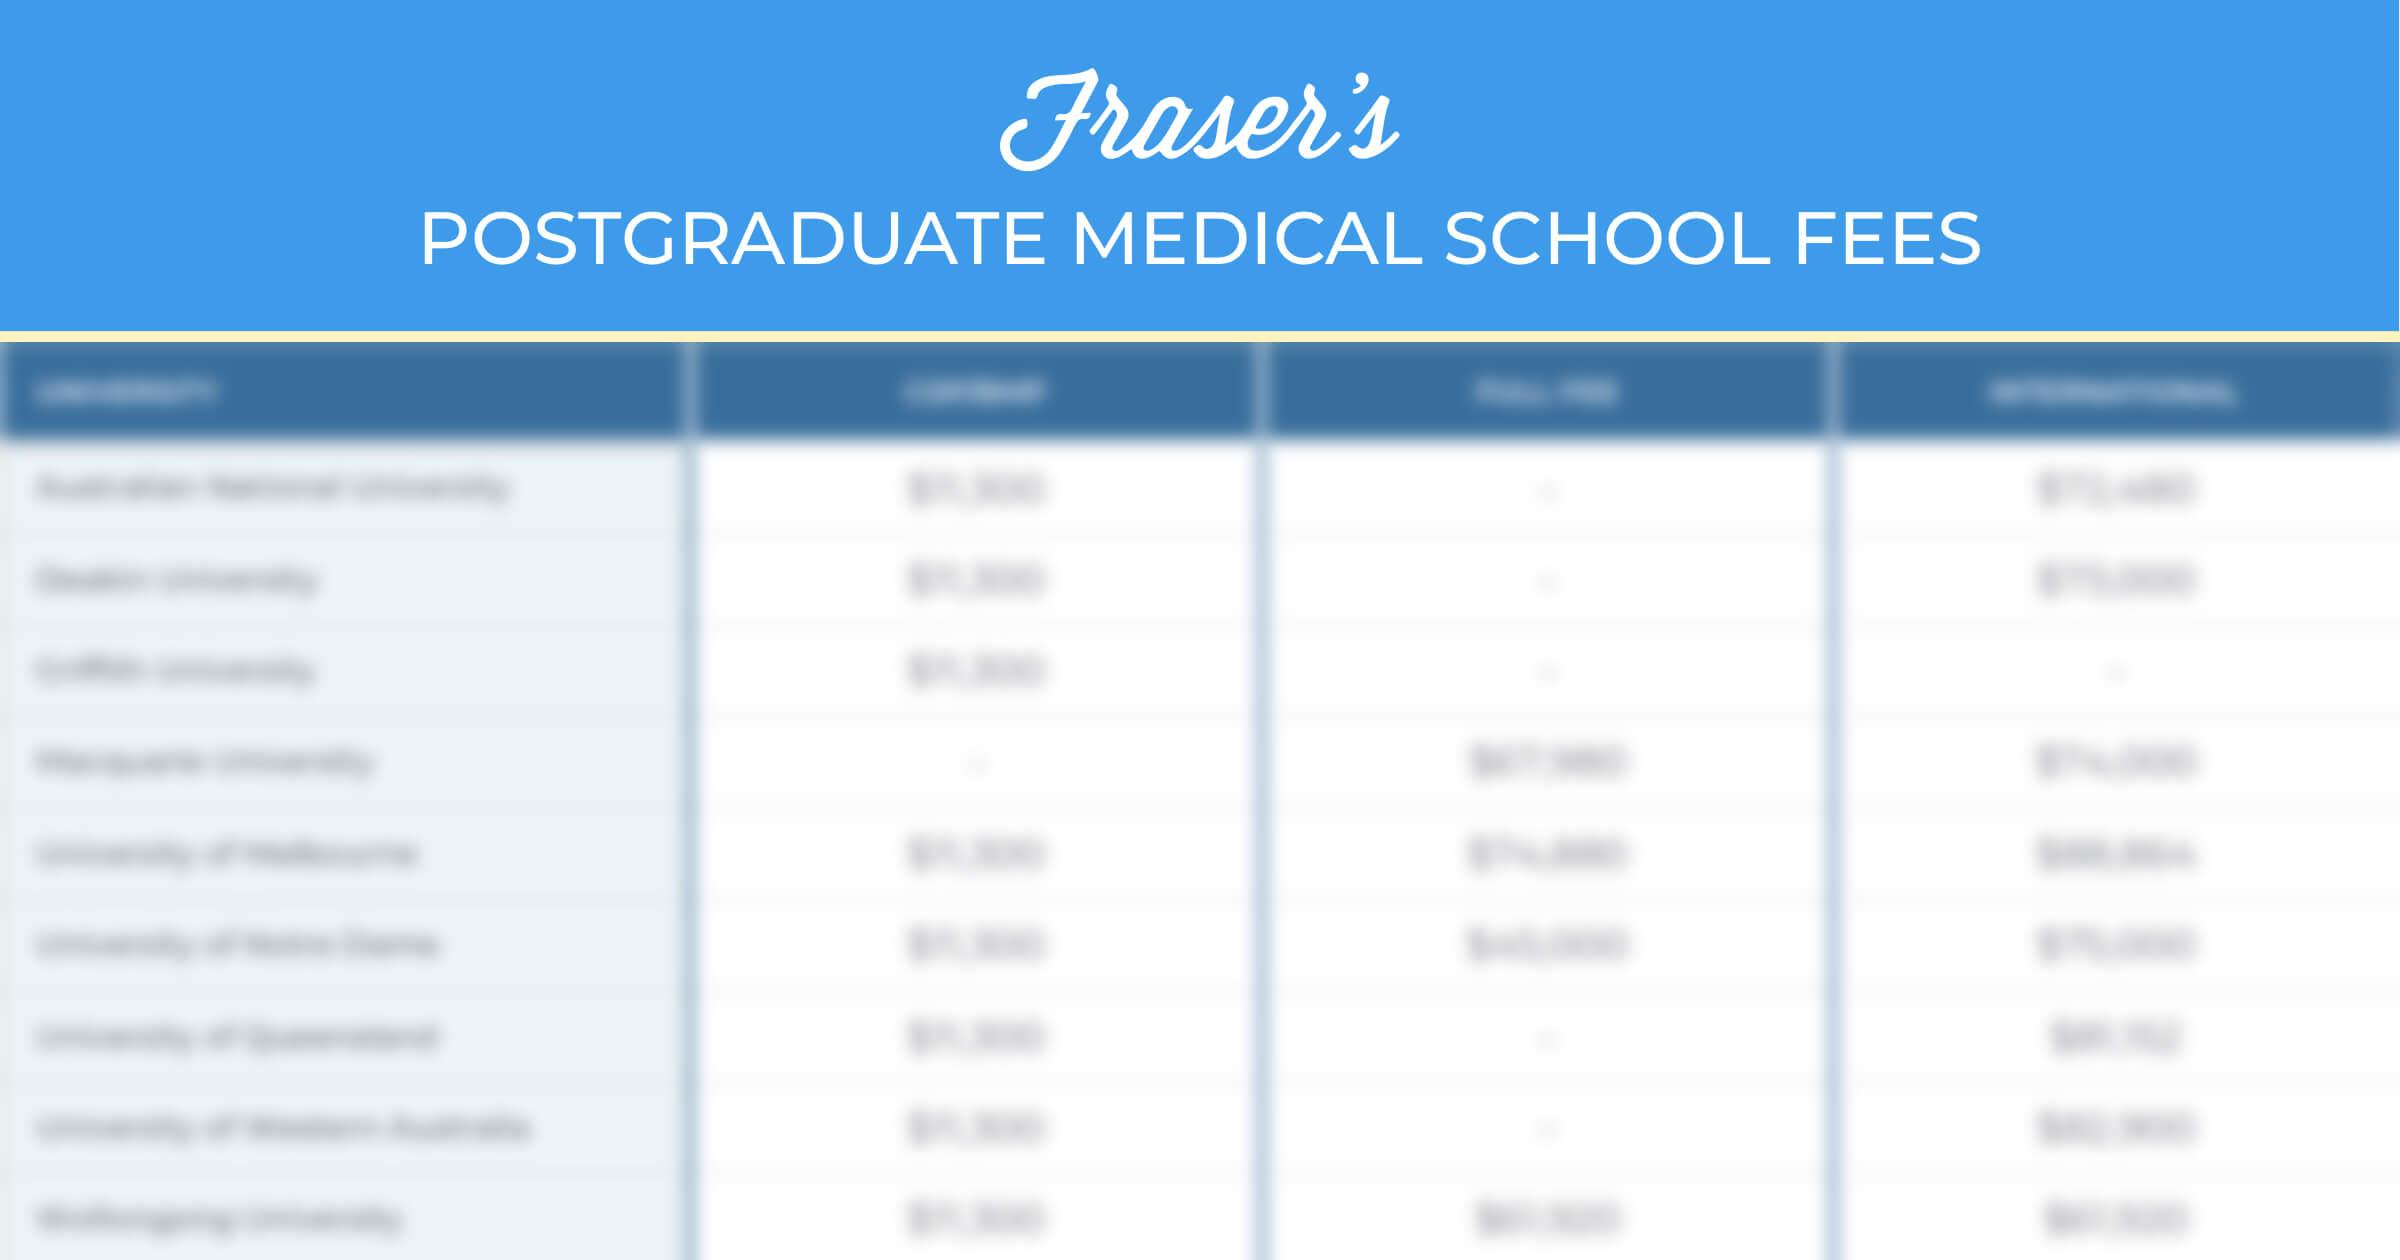 Postgraduate medical school fees